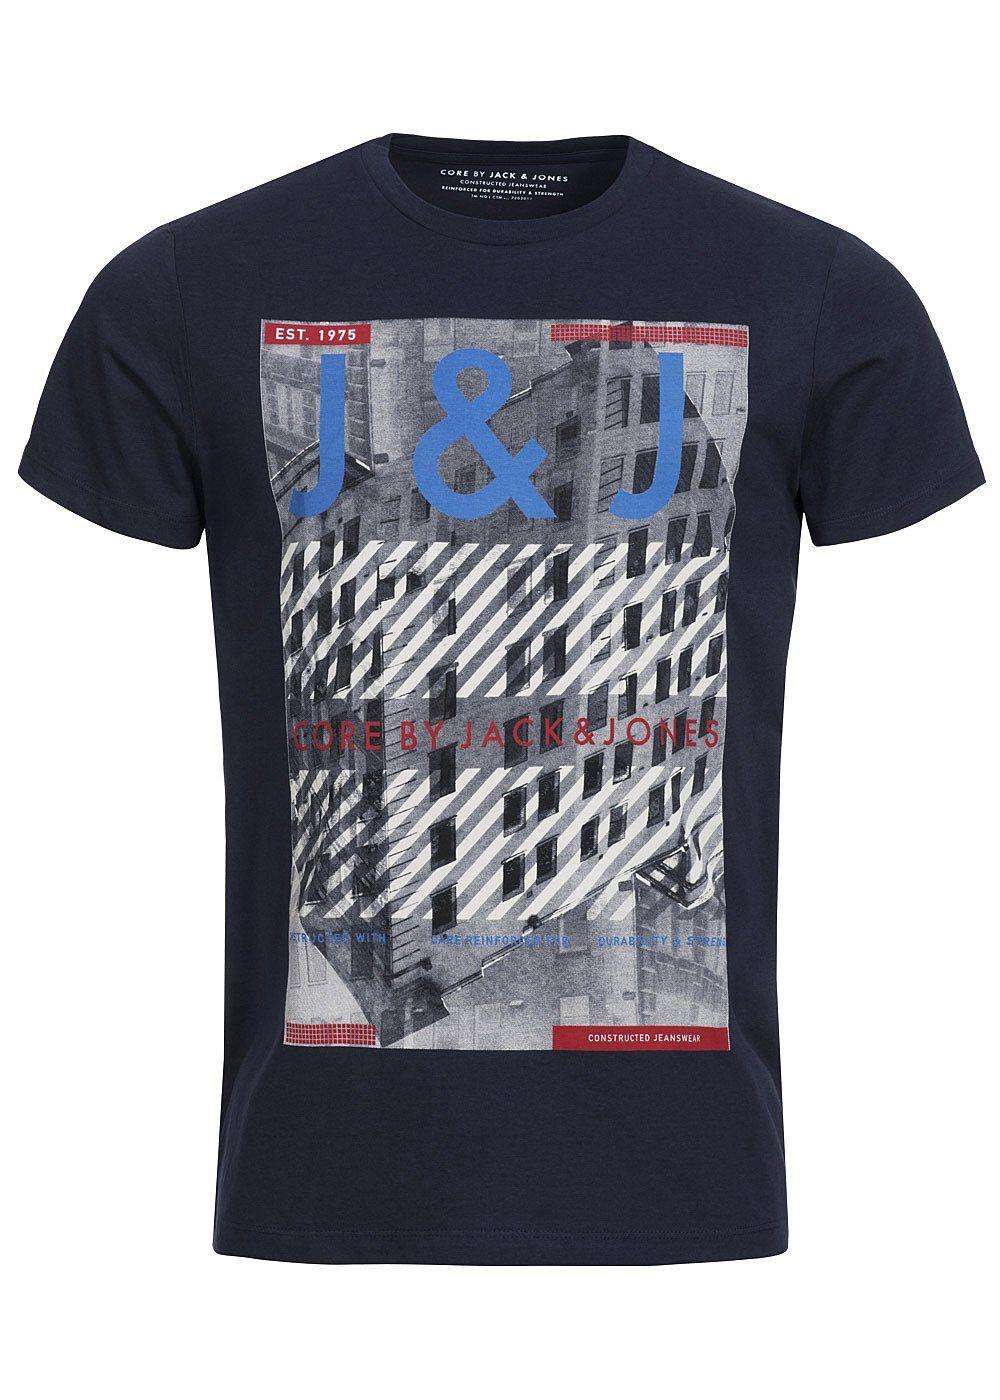 Outlet Fashion Style Mens Jcovana Tee Ss Crew Neck T-Shirt Jack & Jones Explore Online v6JXvk